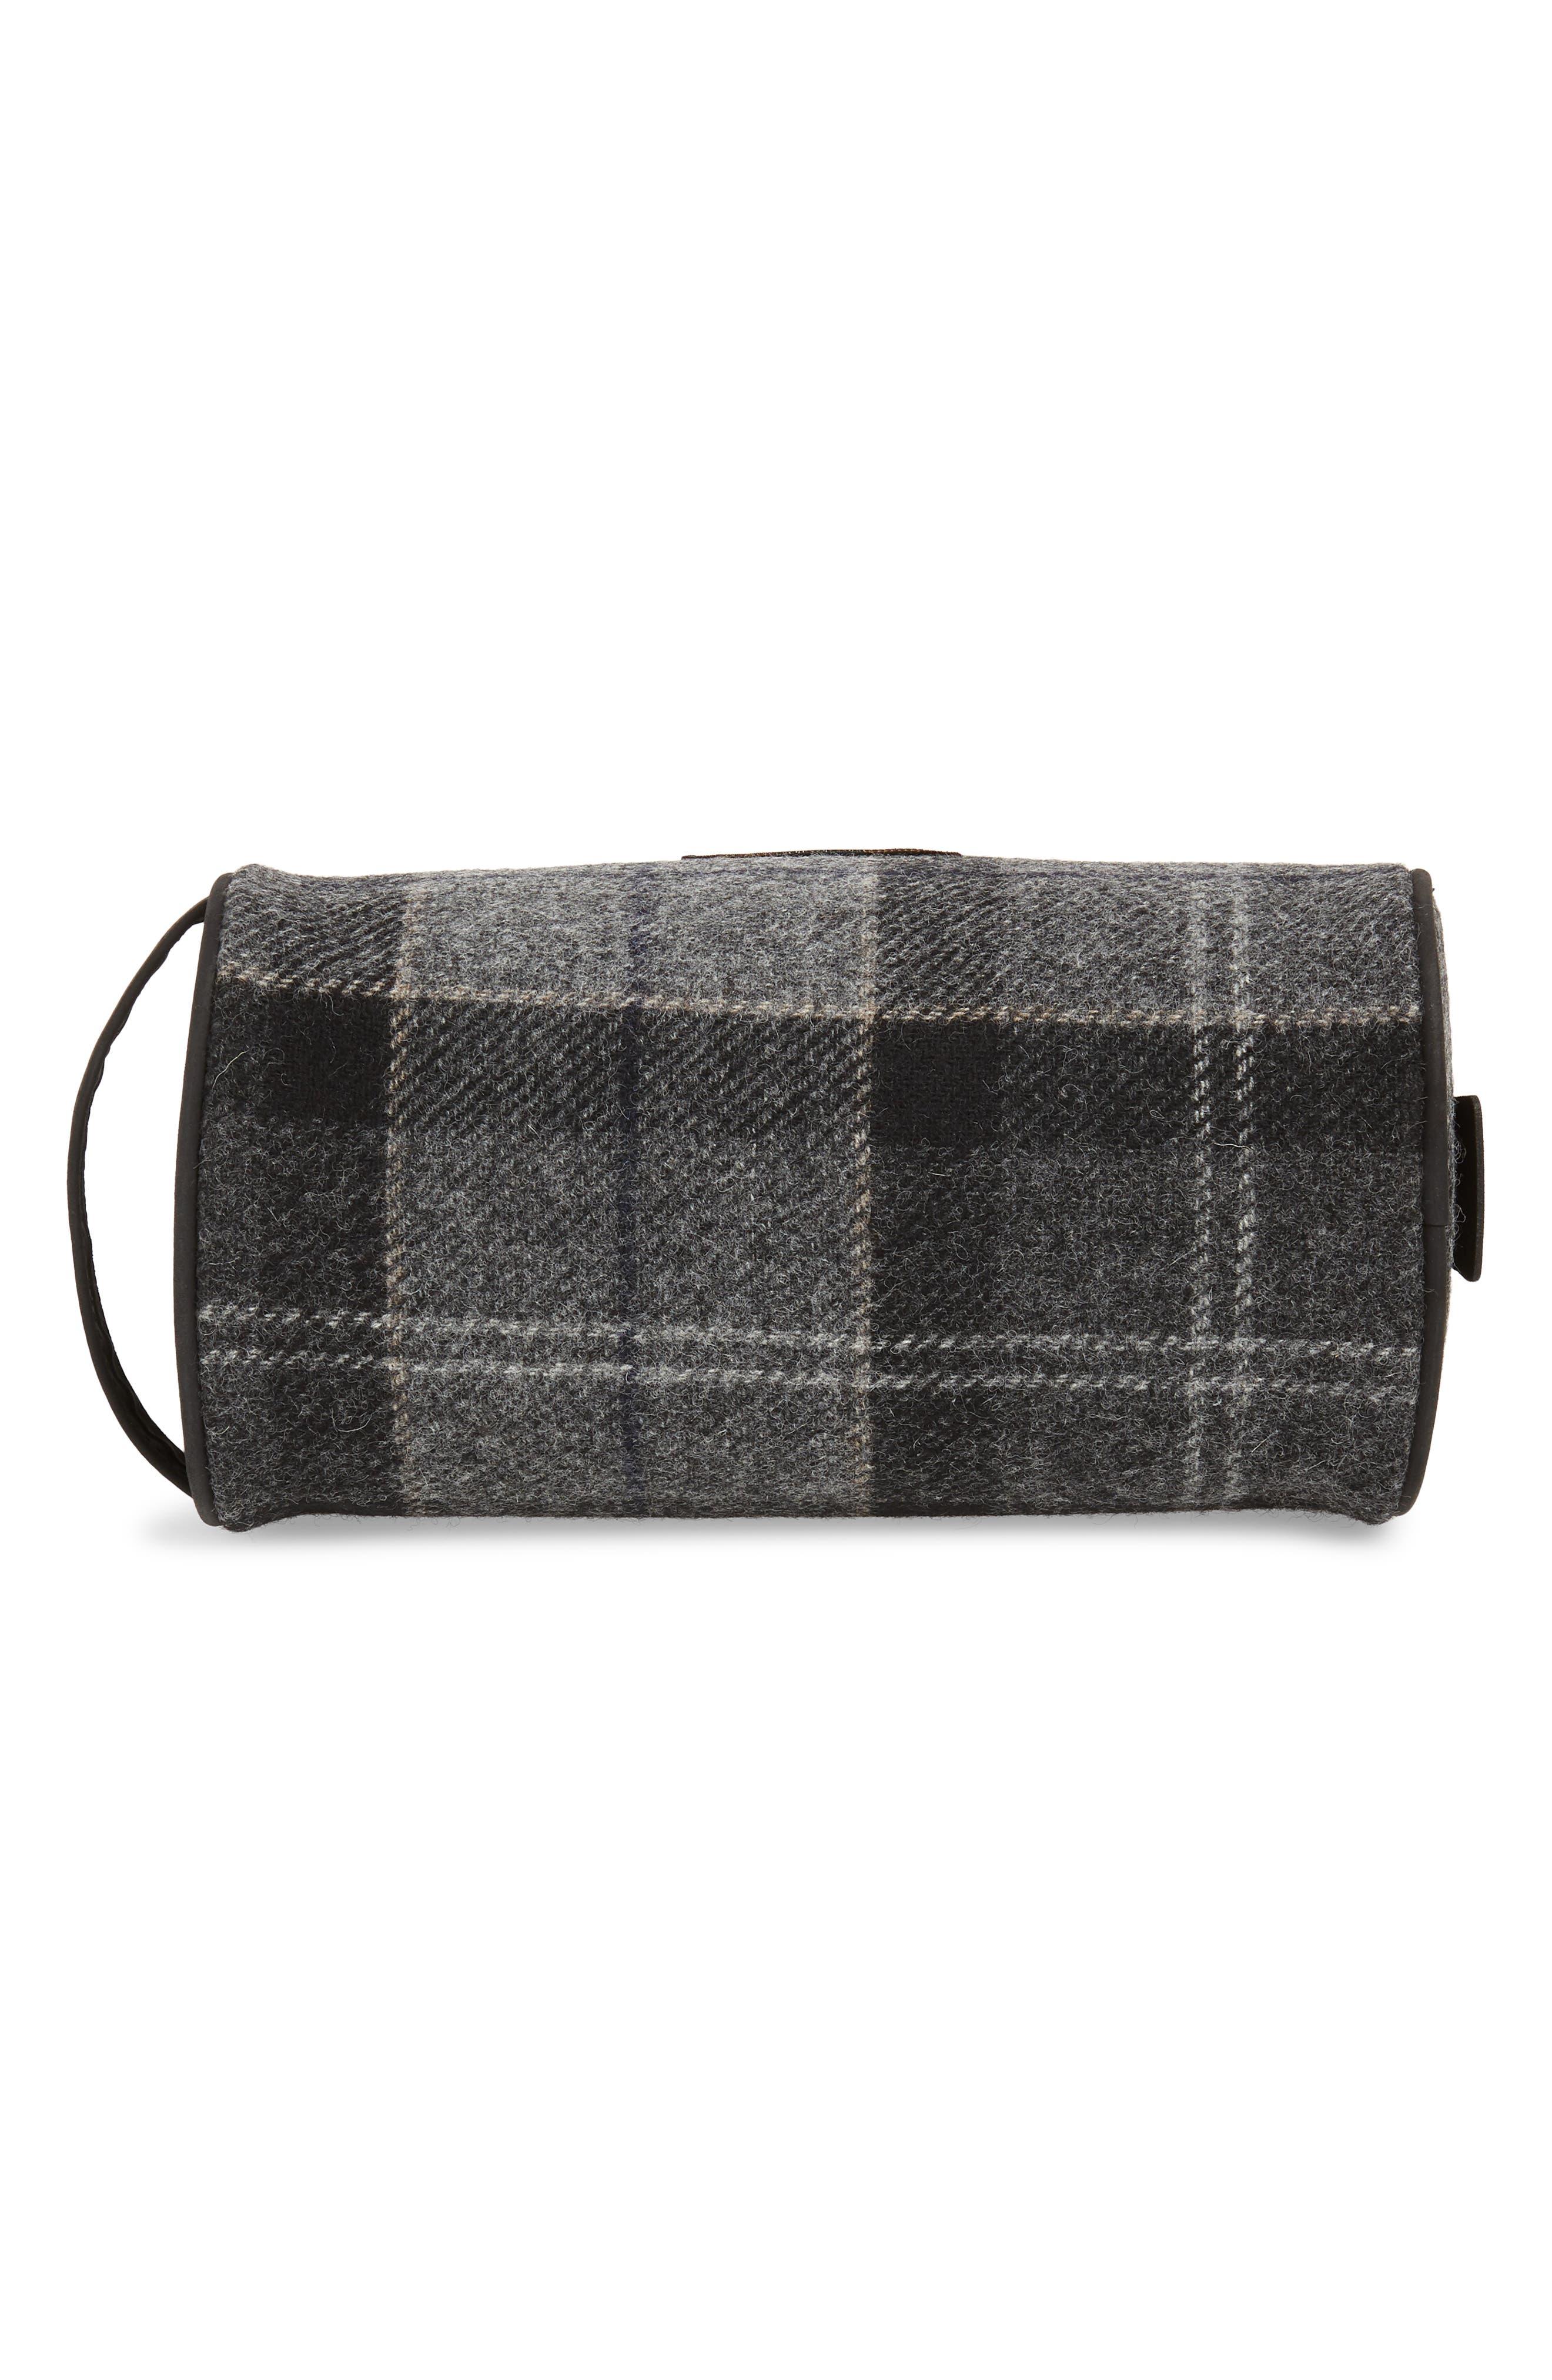 Shadow Tartan Wool Travel Kit,                             Alternate thumbnail 5, color,                             BLACK/ GREY TARTAN